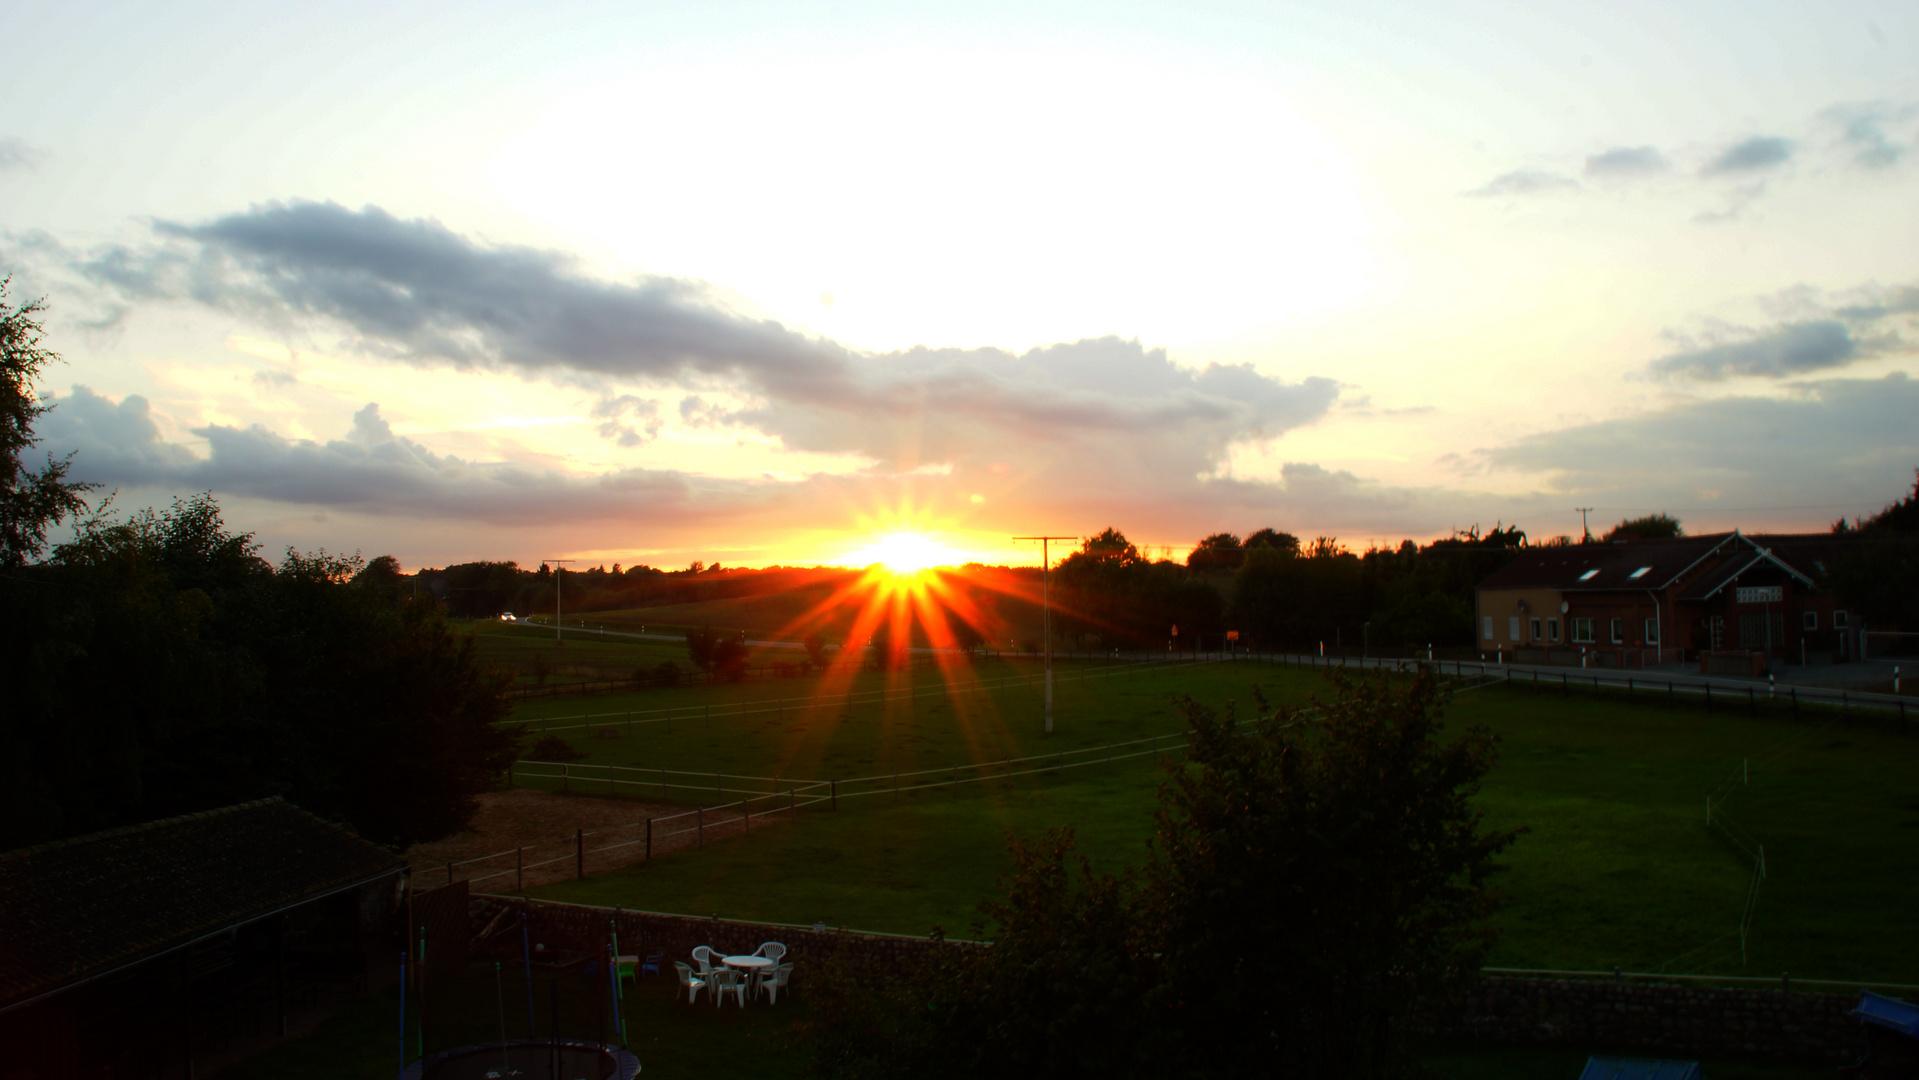 Sonnenuntergang in Wangels an der Ostsee 2